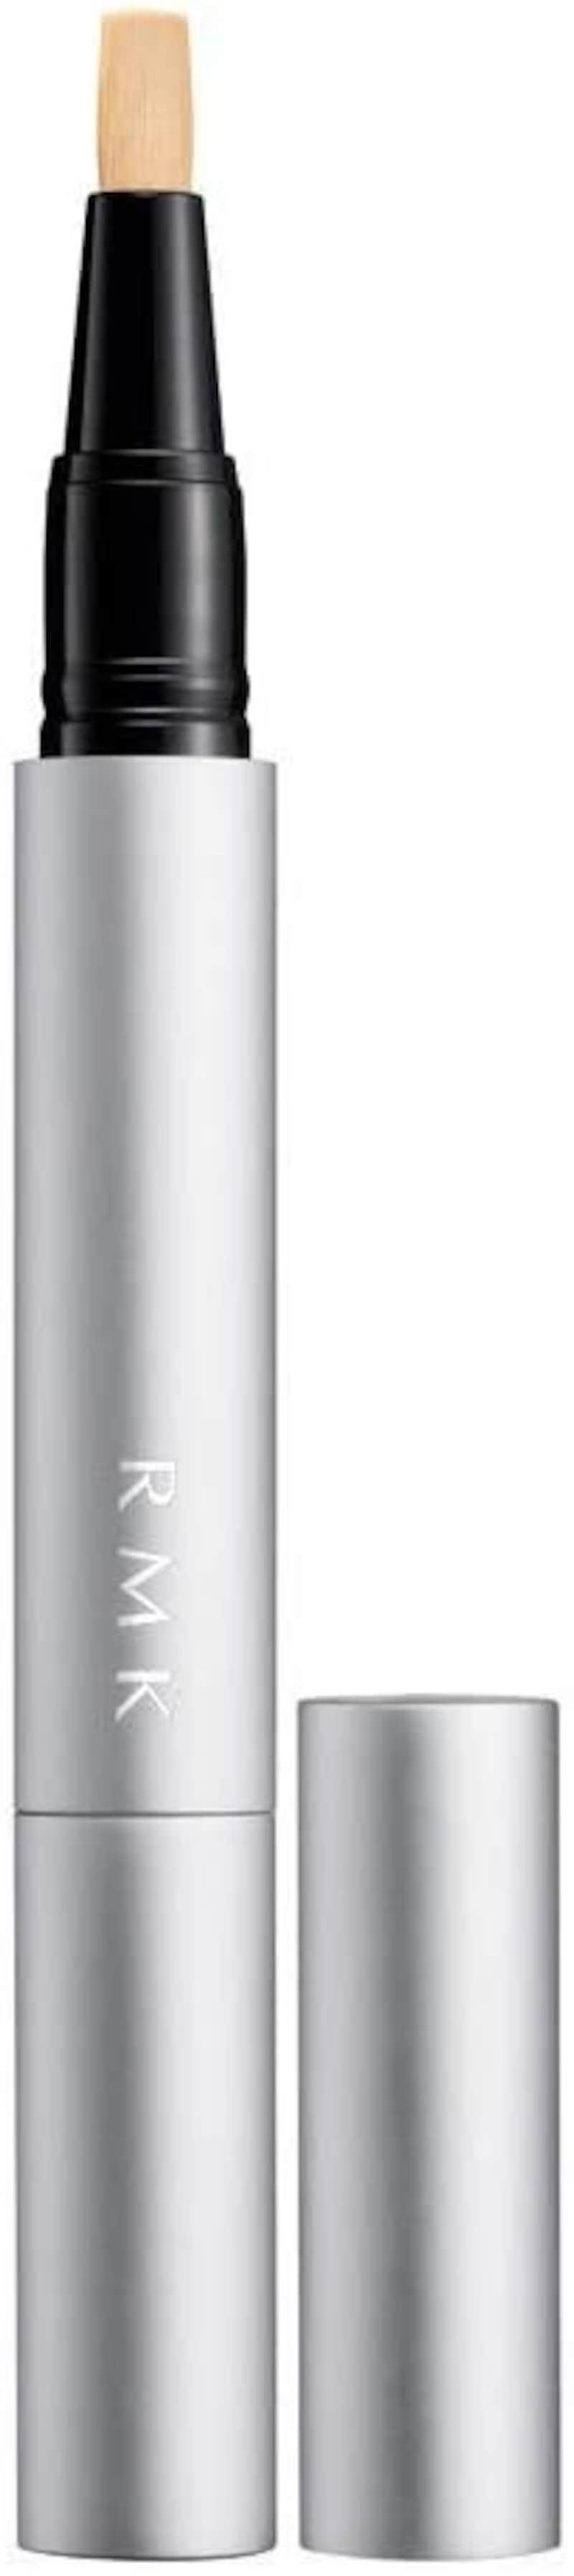 RMK,ルミナス ペンブラッシュ コンシーラー 04